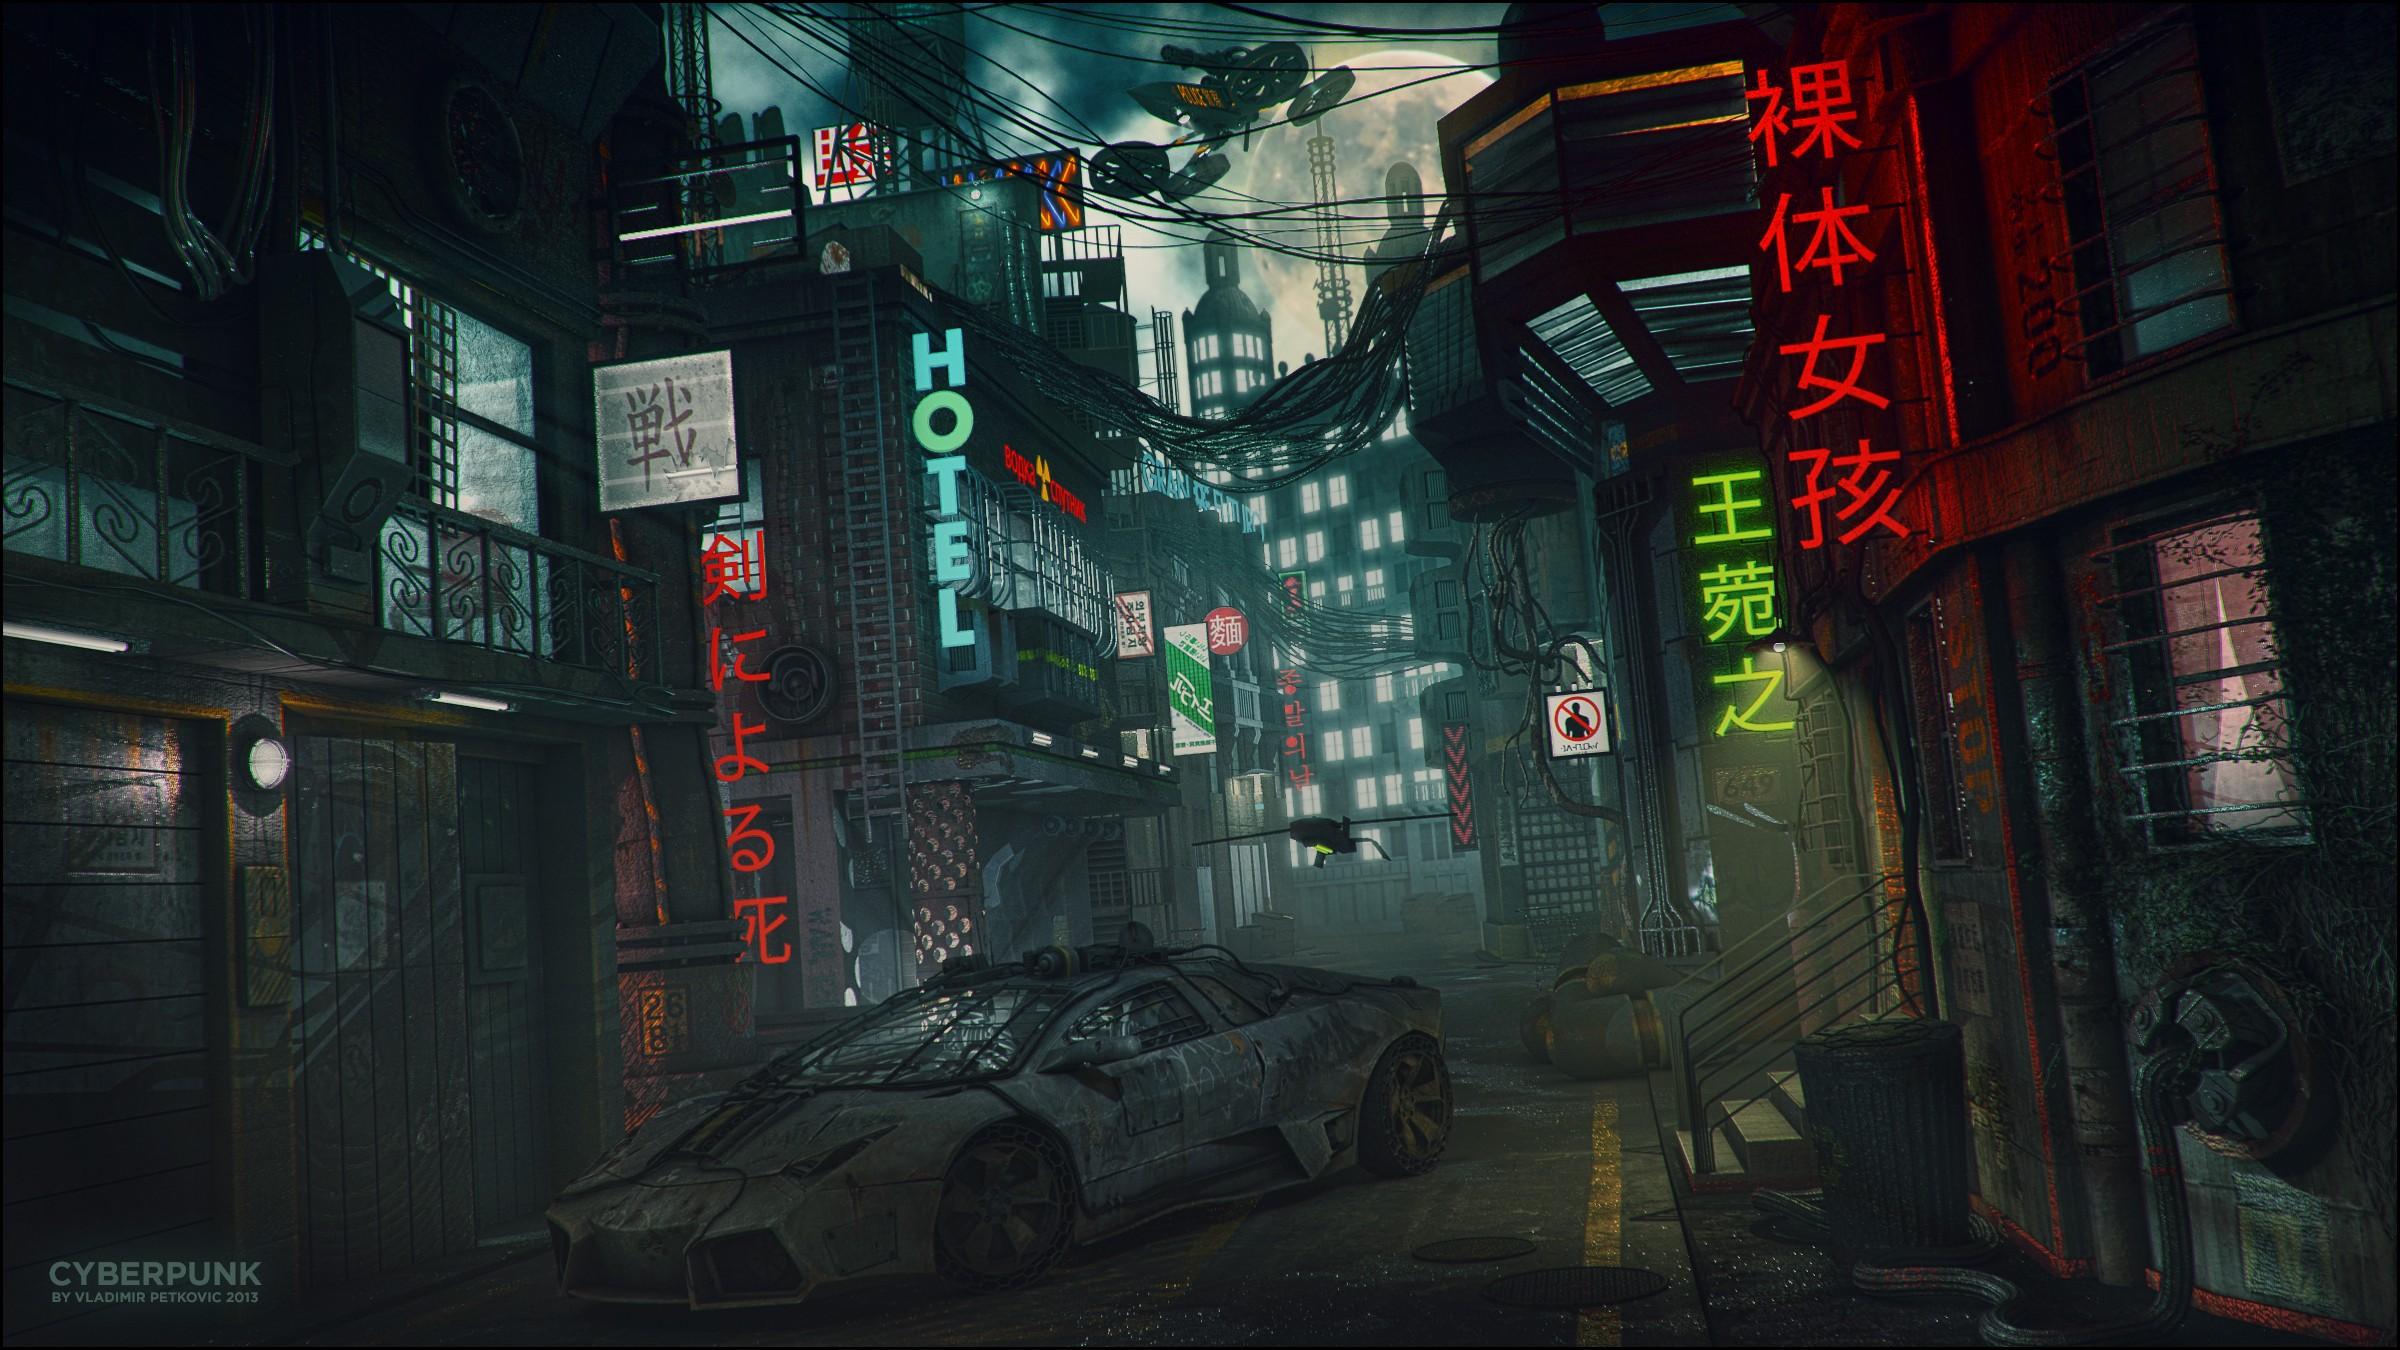 cyberpunk Lamborghini Neon Wallpapers HD Desktop and 2400x1350